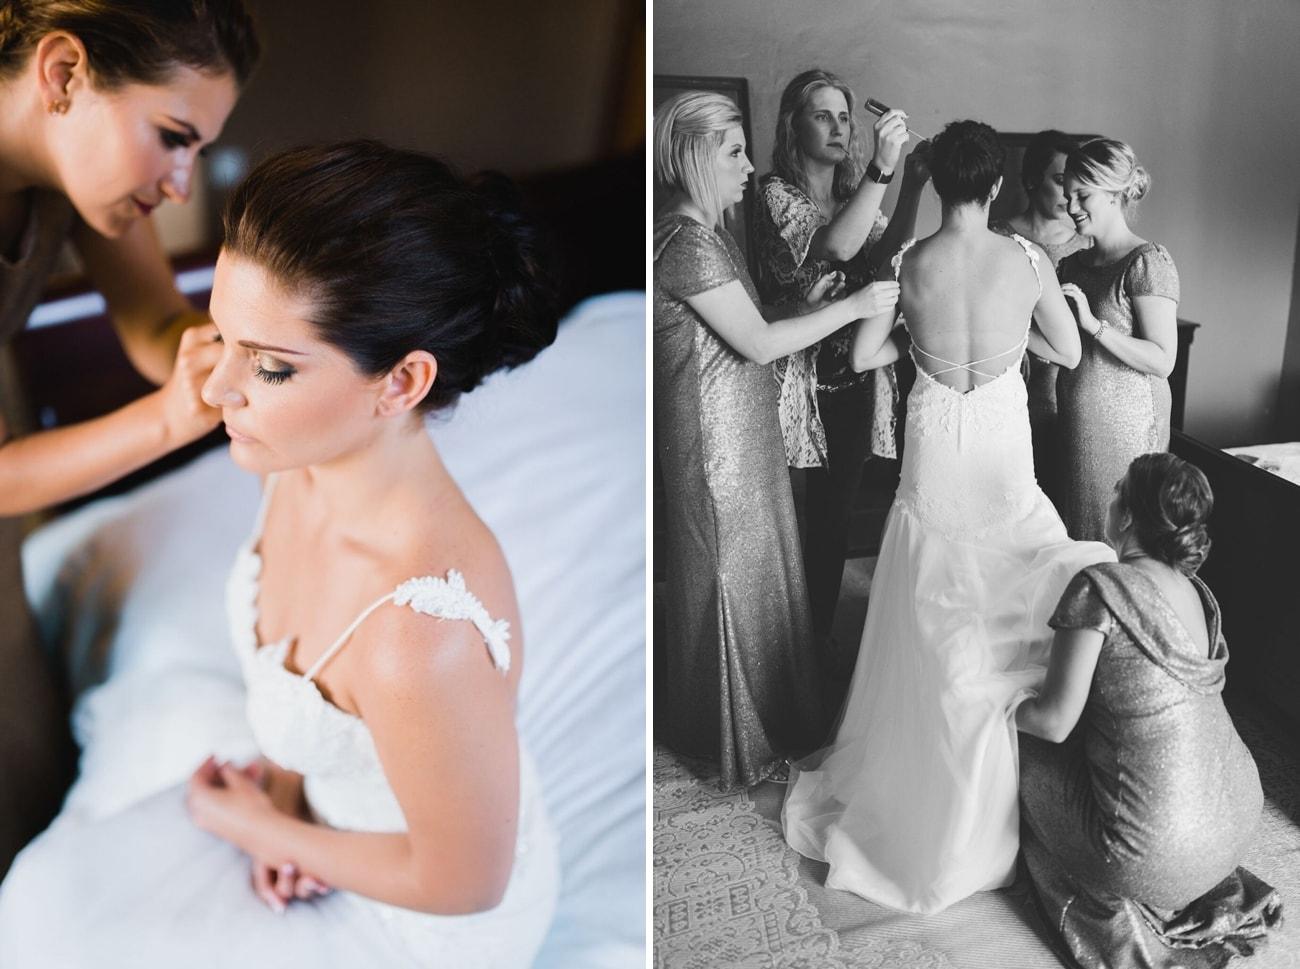 Bride getting ready | Credit: Matthew Carr